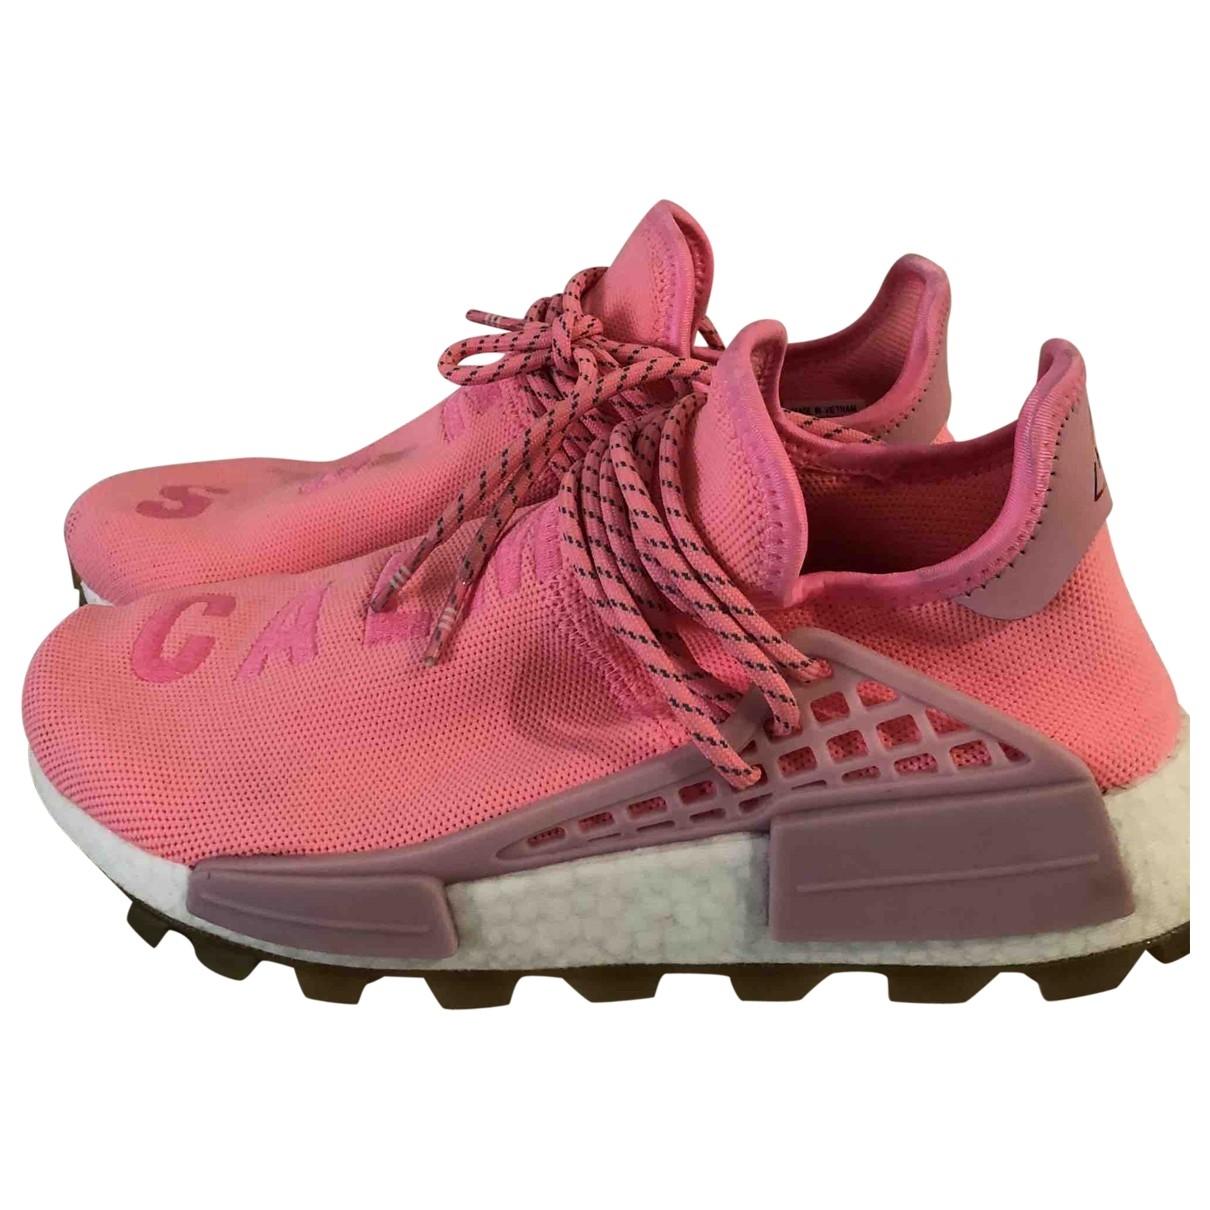 Adidas X Pharrell Williams - Baskets NMD Hu pour femme en toile - rose